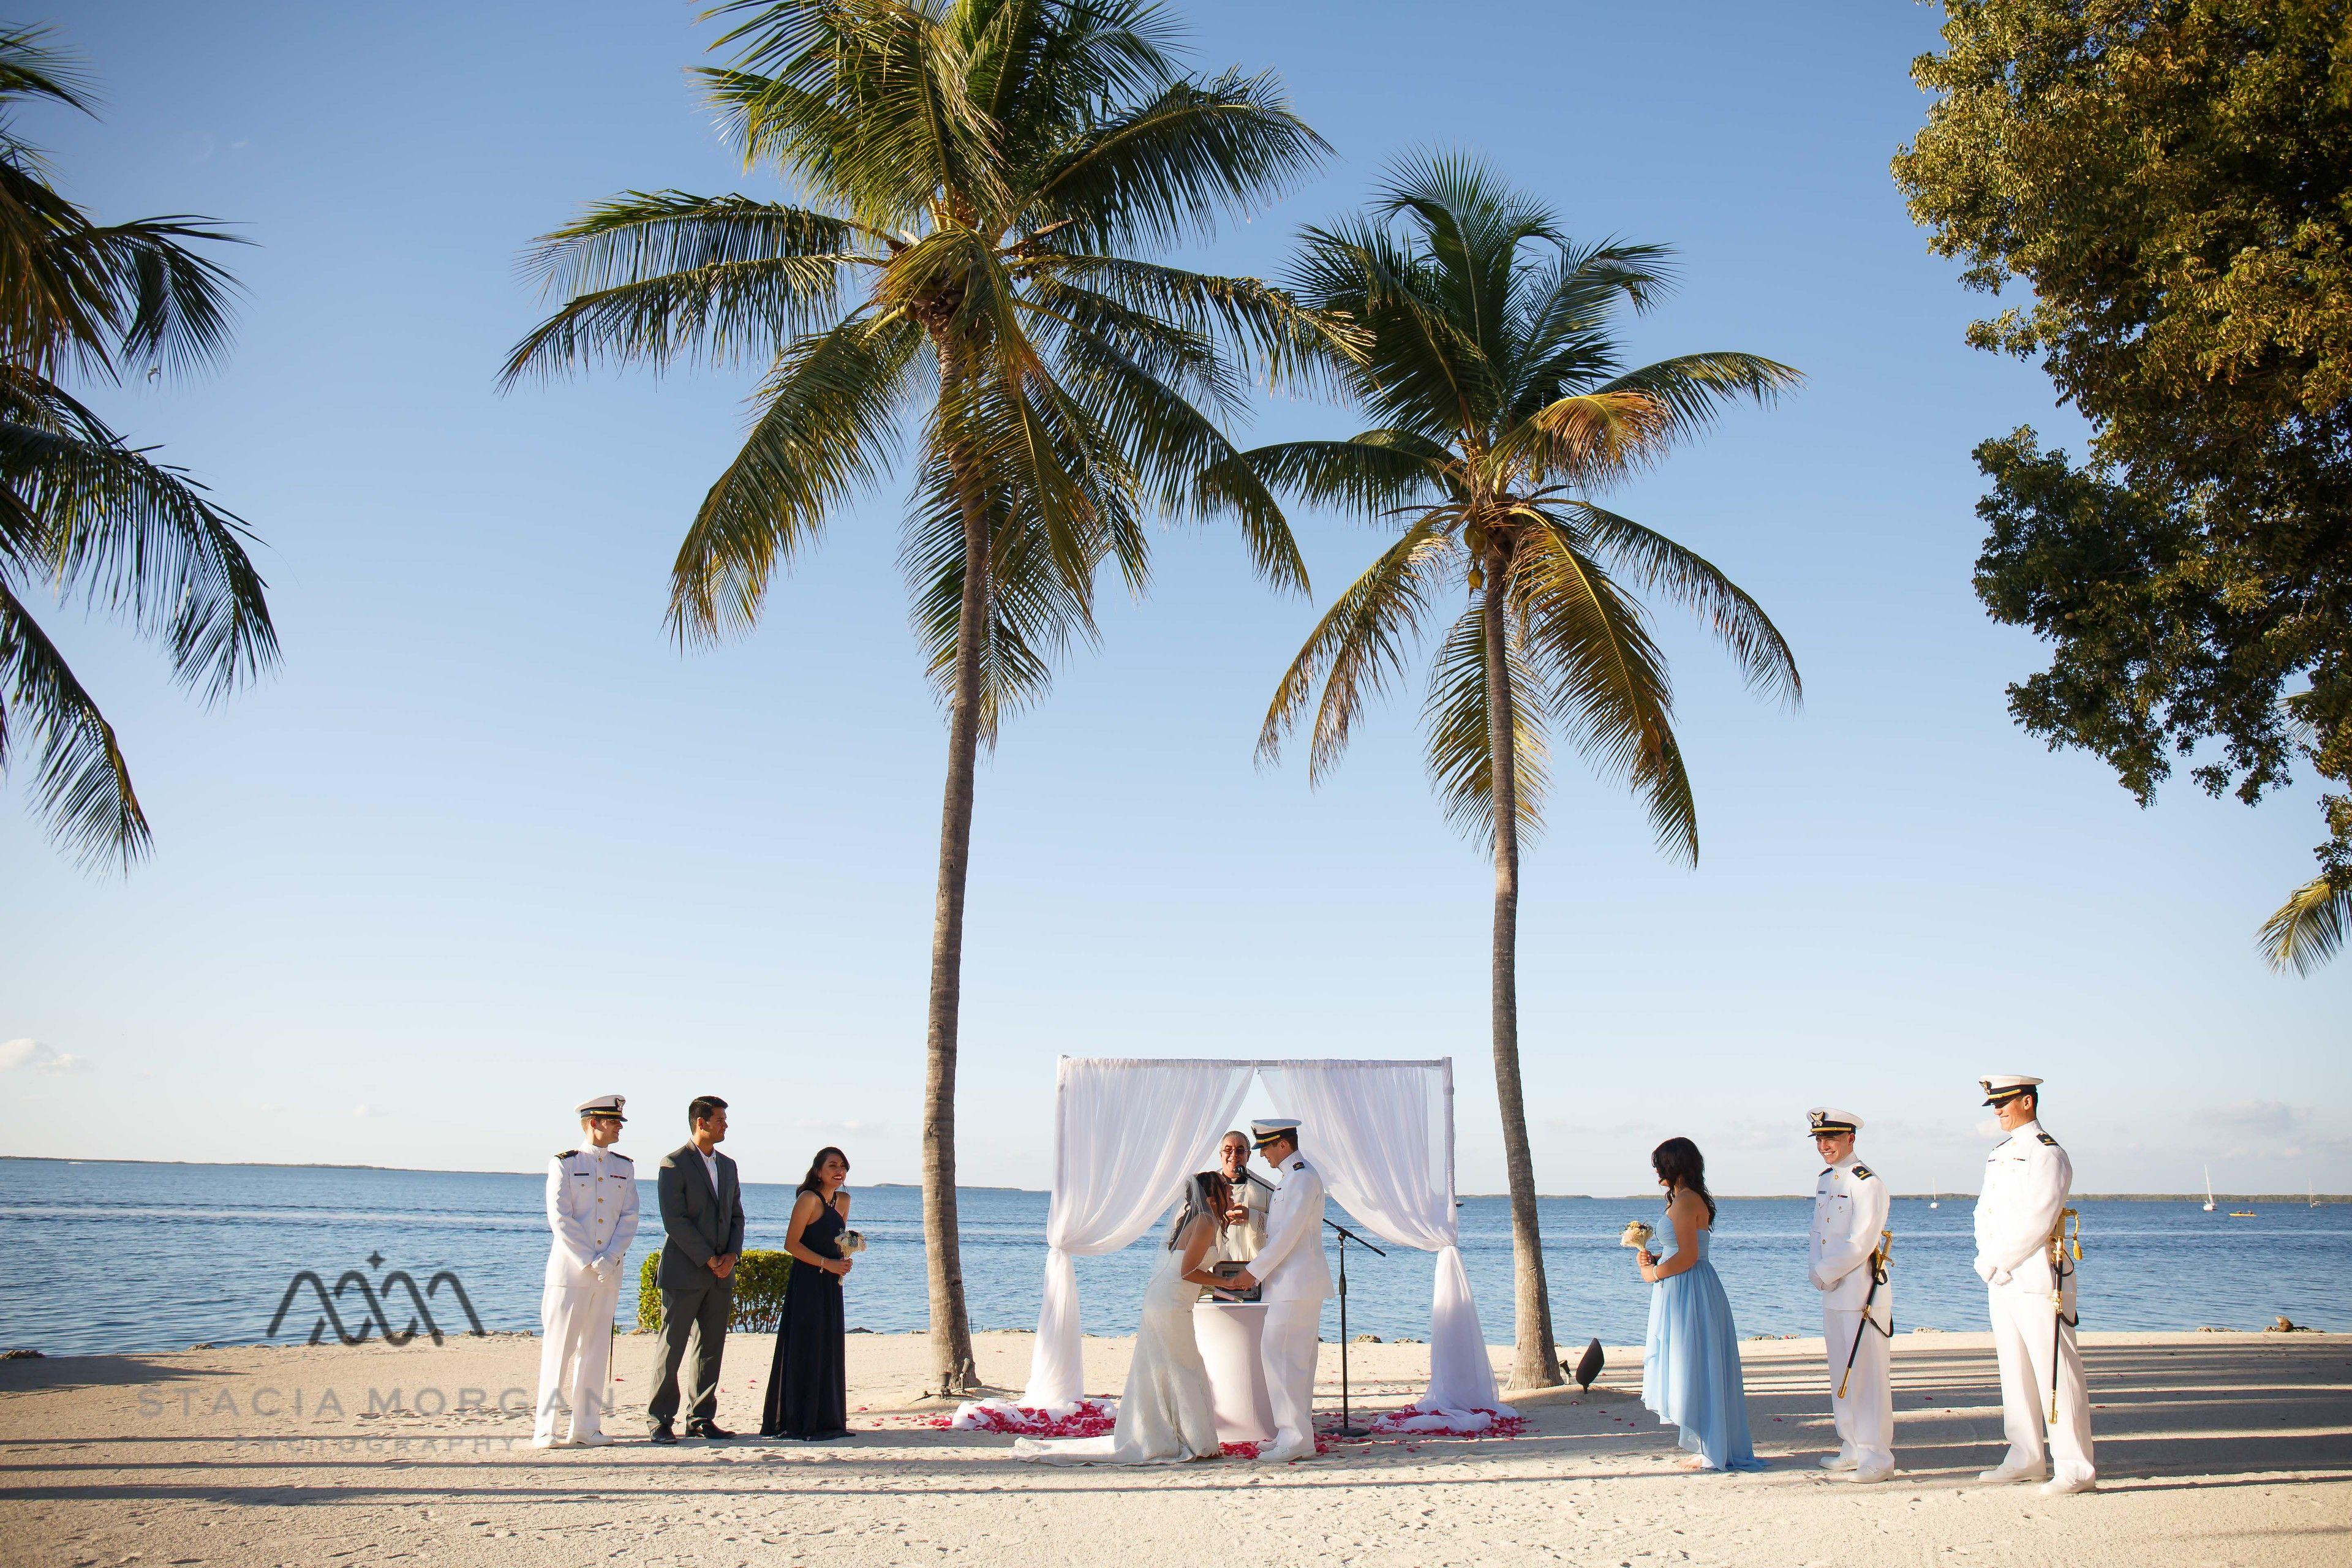 Florida Destination Weddings Private Beach Weddings In Florida Key Largo Lighthouse Beach Destin Florida Wedding Florida Destination Wedding Venues Florida Destinations